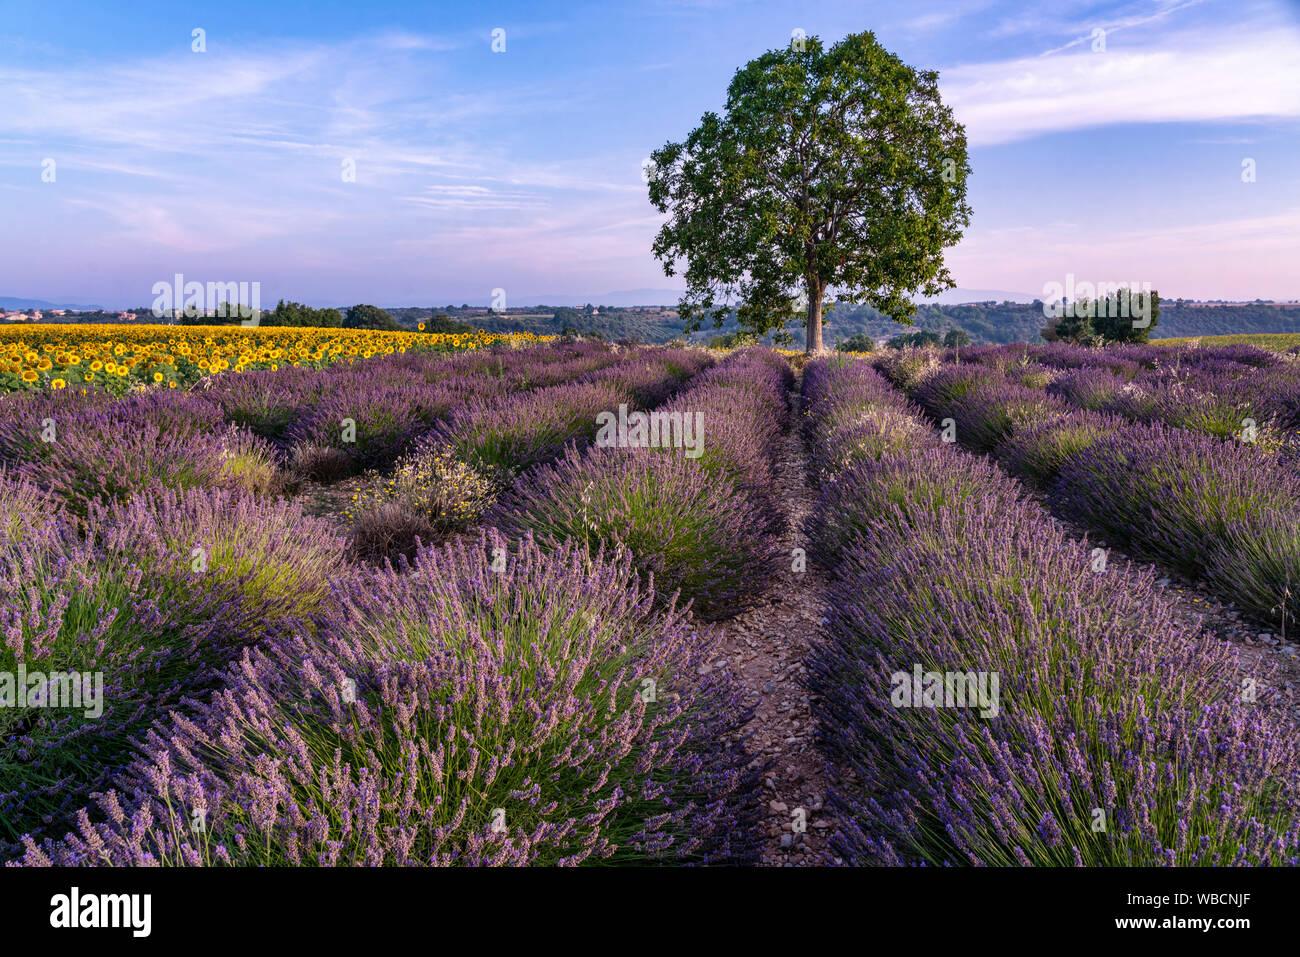 Lavender and sunflower field, Lavandula angustifolia, Plateau de Valensole, France, Provence-Alpes-Cote d'Azur, France Stock Photo